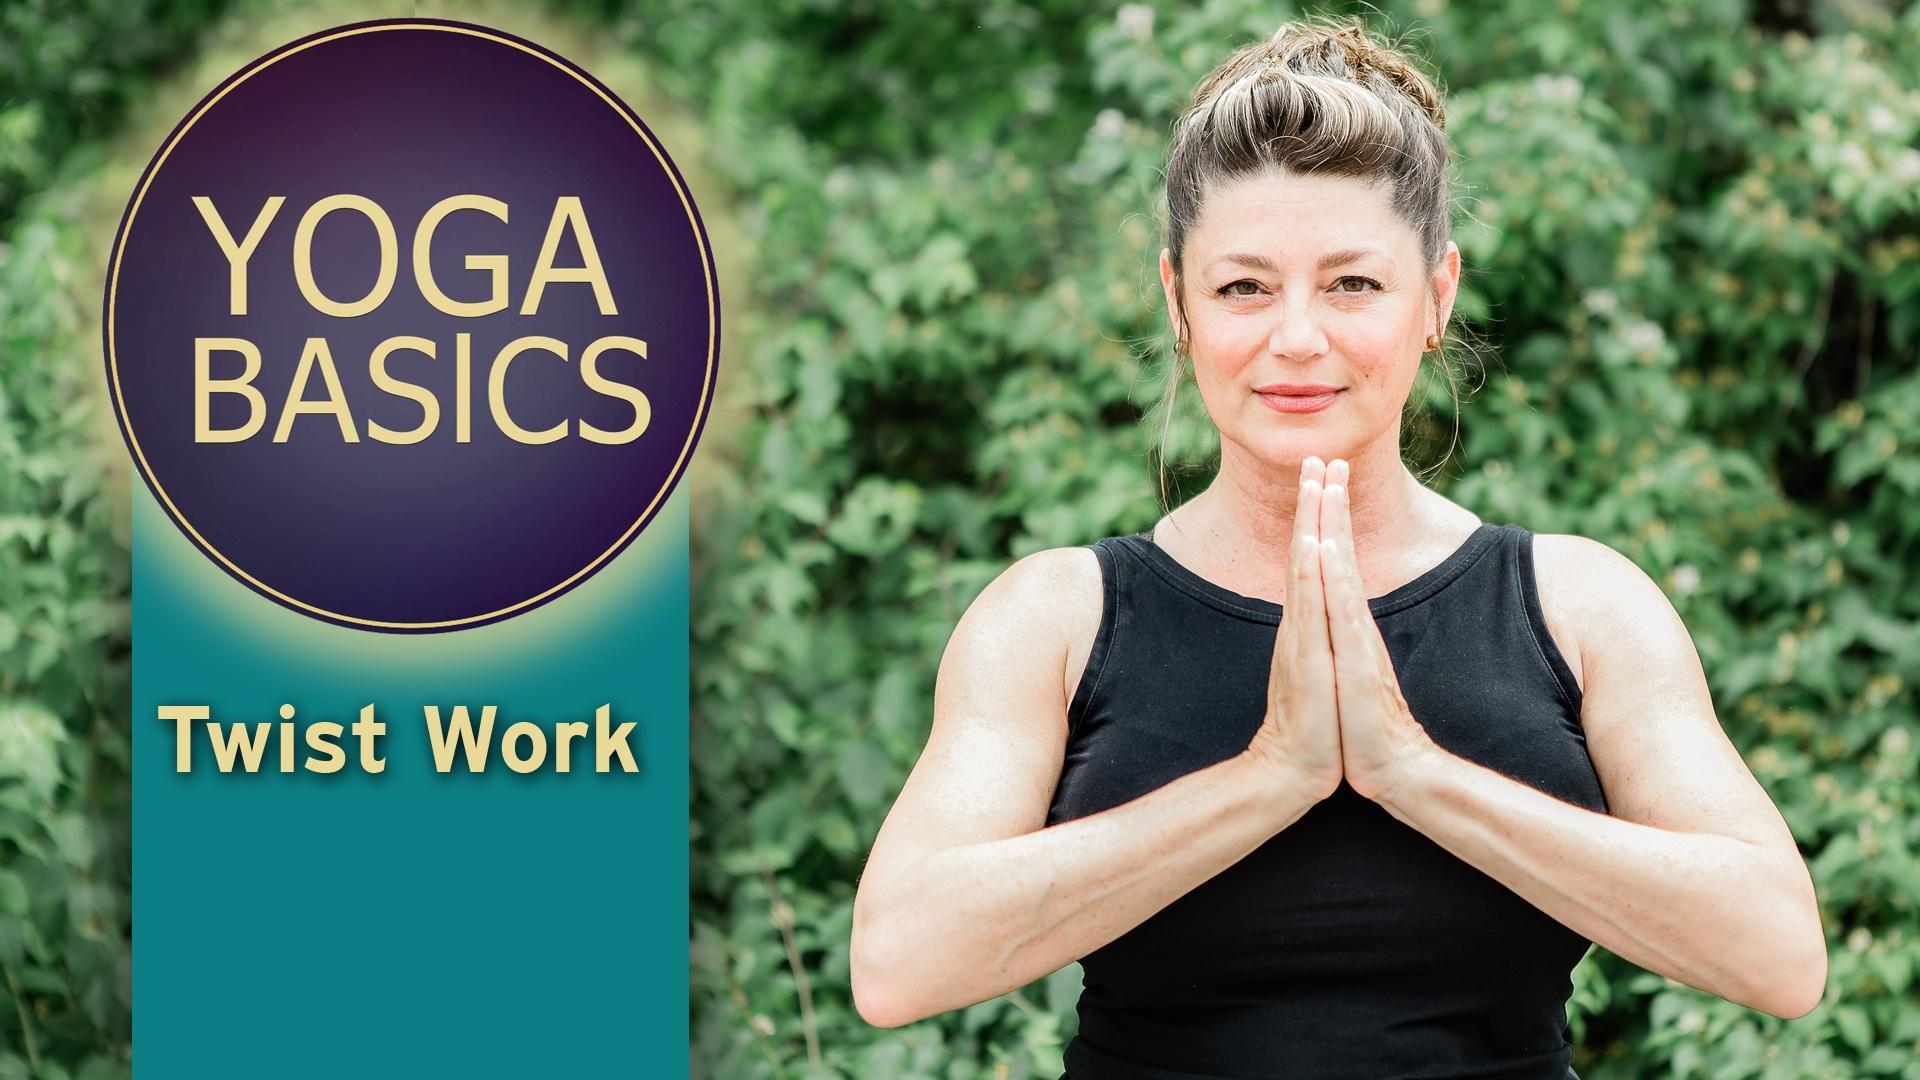 Yoga Basics with patty: Twist Work